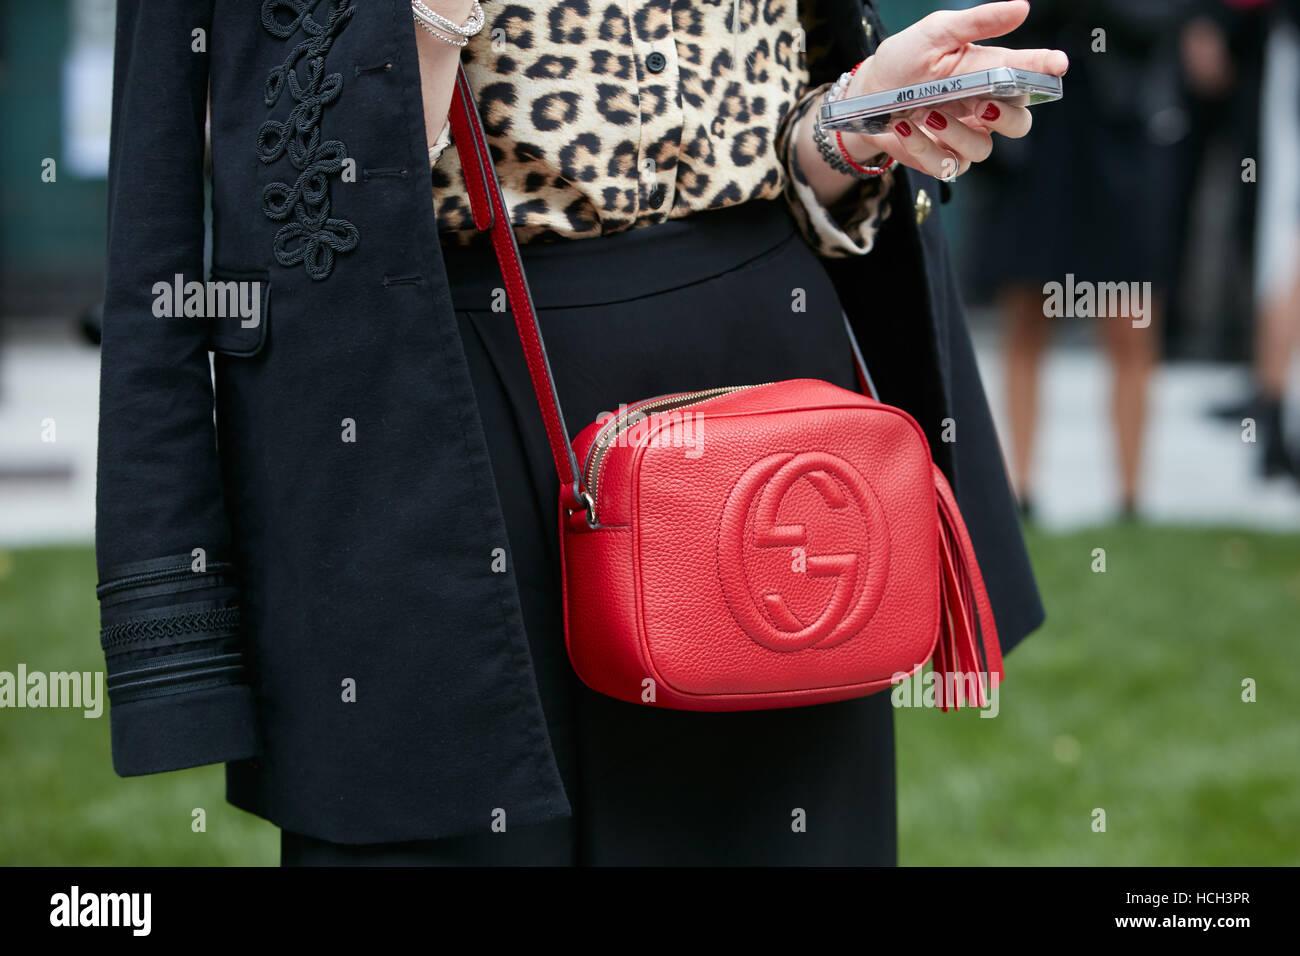 180a37aeff1 Woman with red Gucci leather bag before Giorgio Armani fashion show